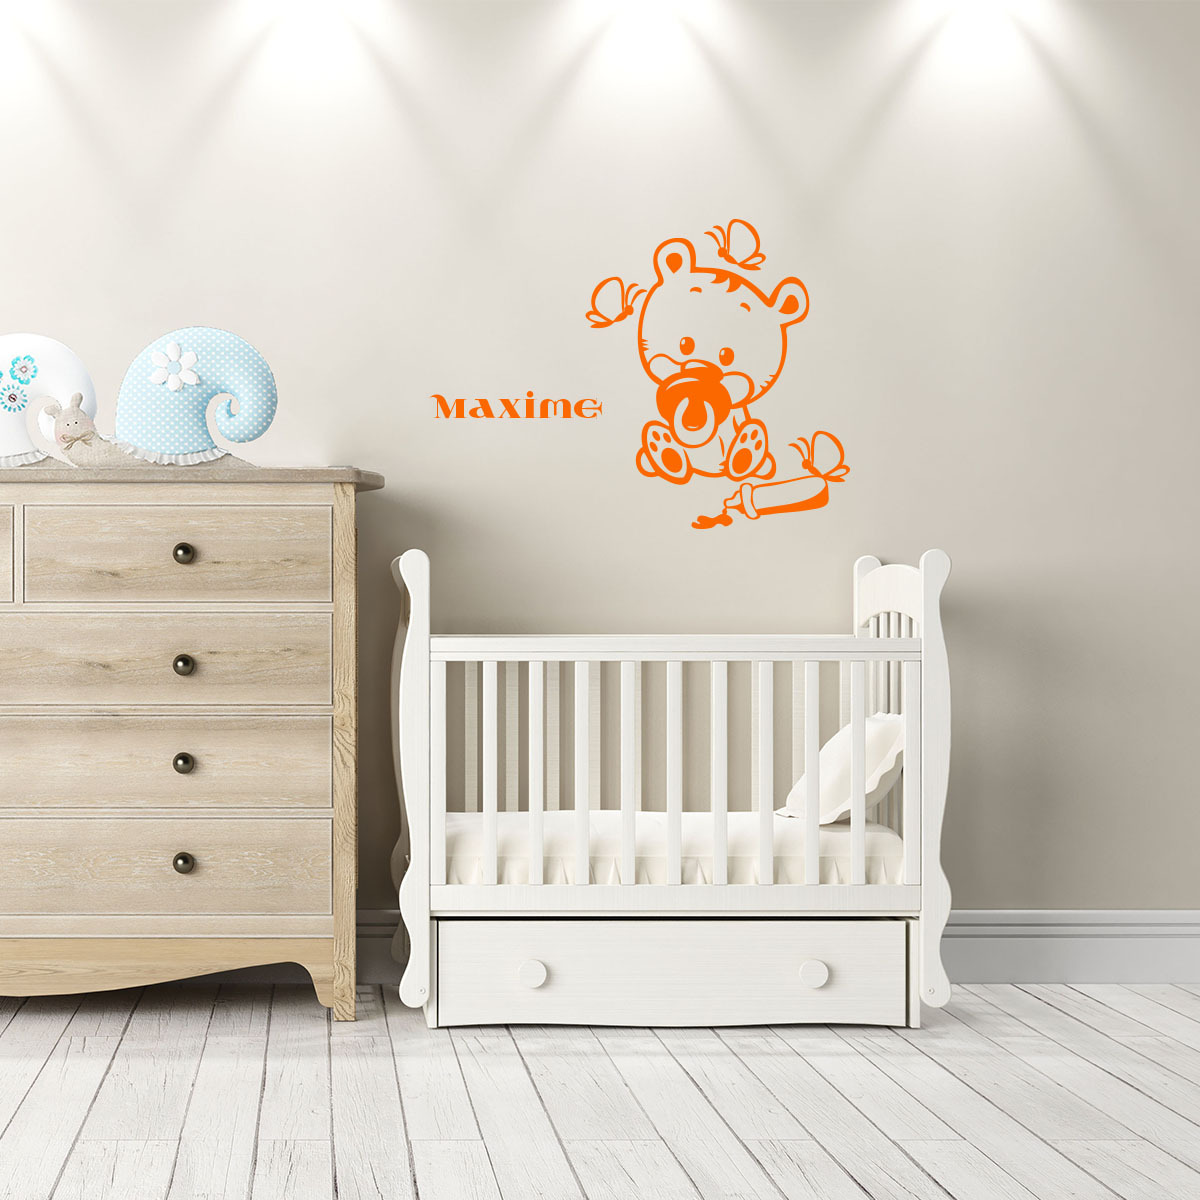 sticker pr nom personnalis b b ourson texte. Black Bedroom Furniture Sets. Home Design Ideas